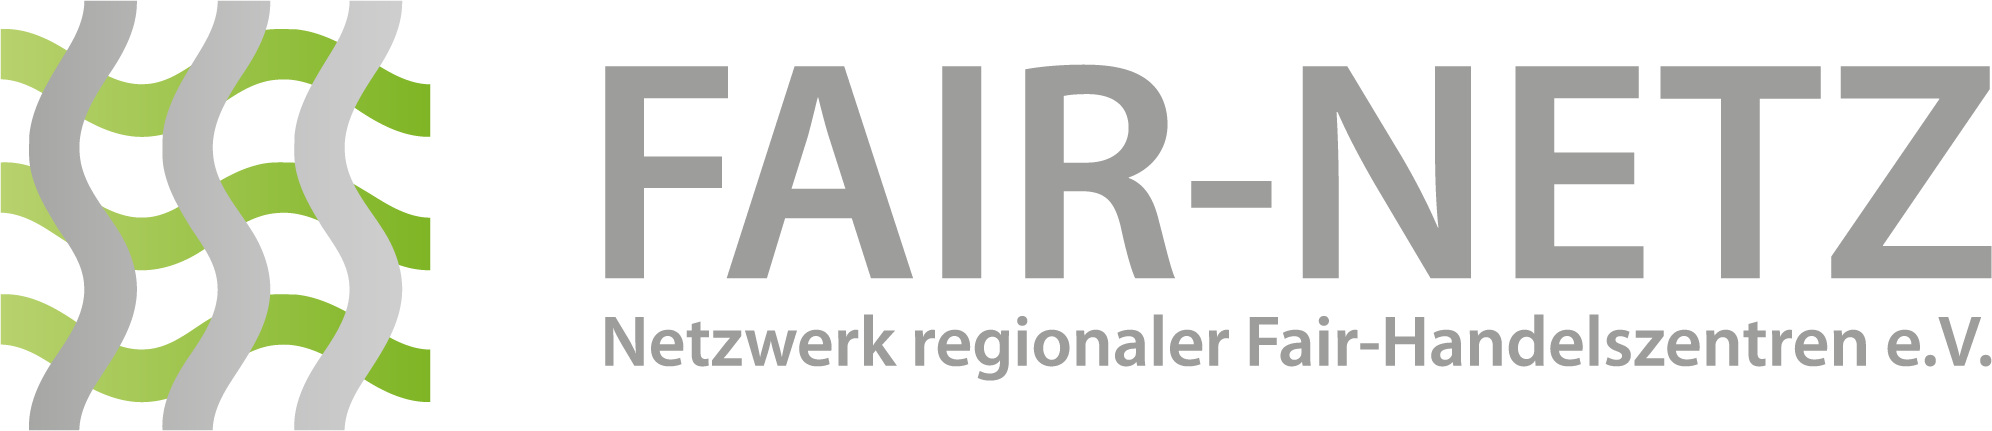 FAIR-NETZ Logo